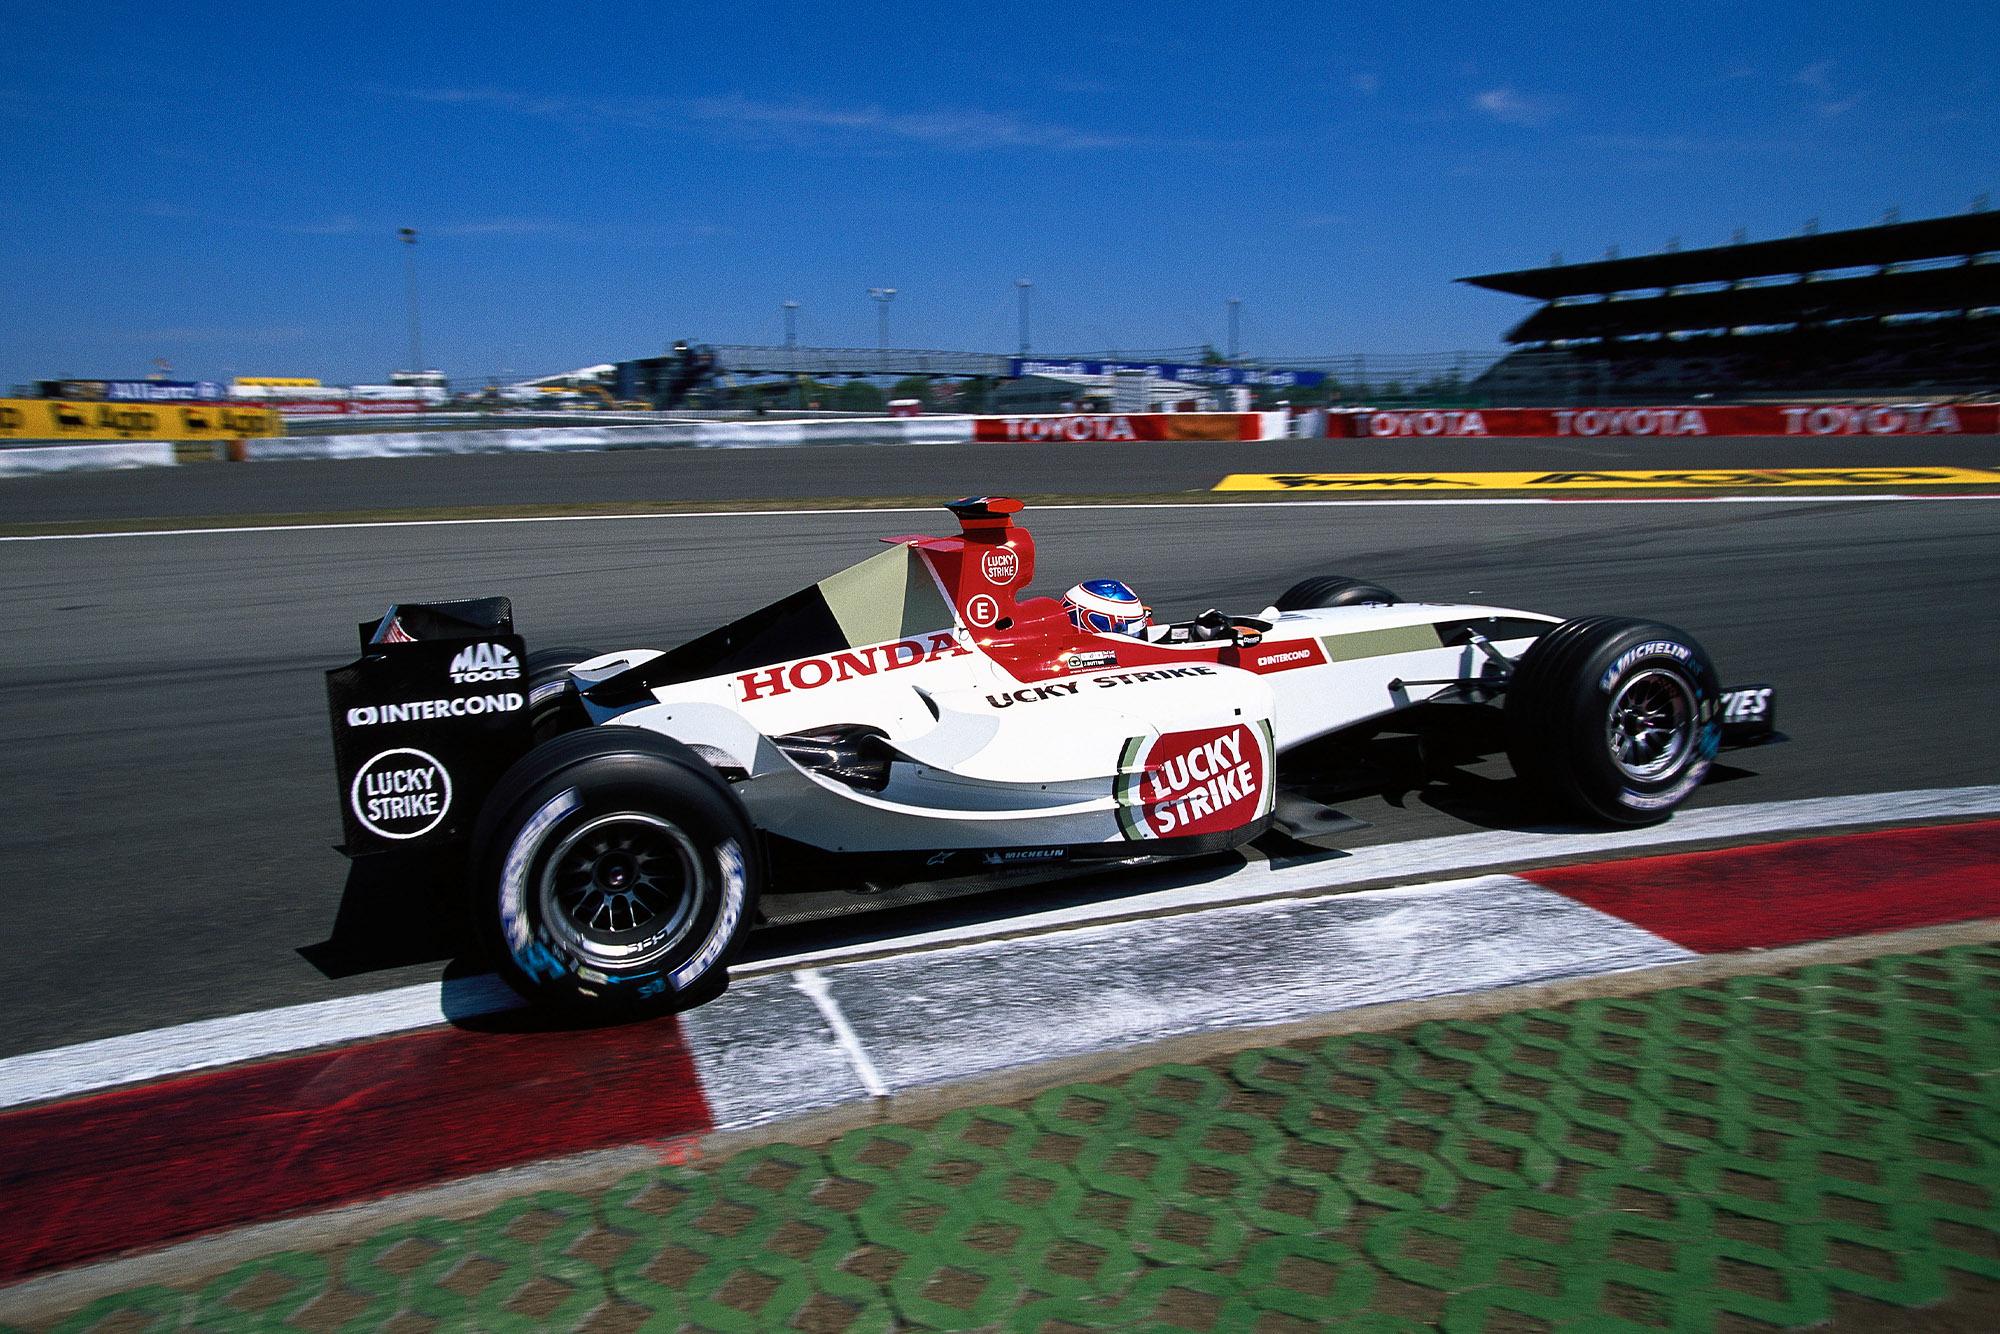 Jenson Button's BAR006